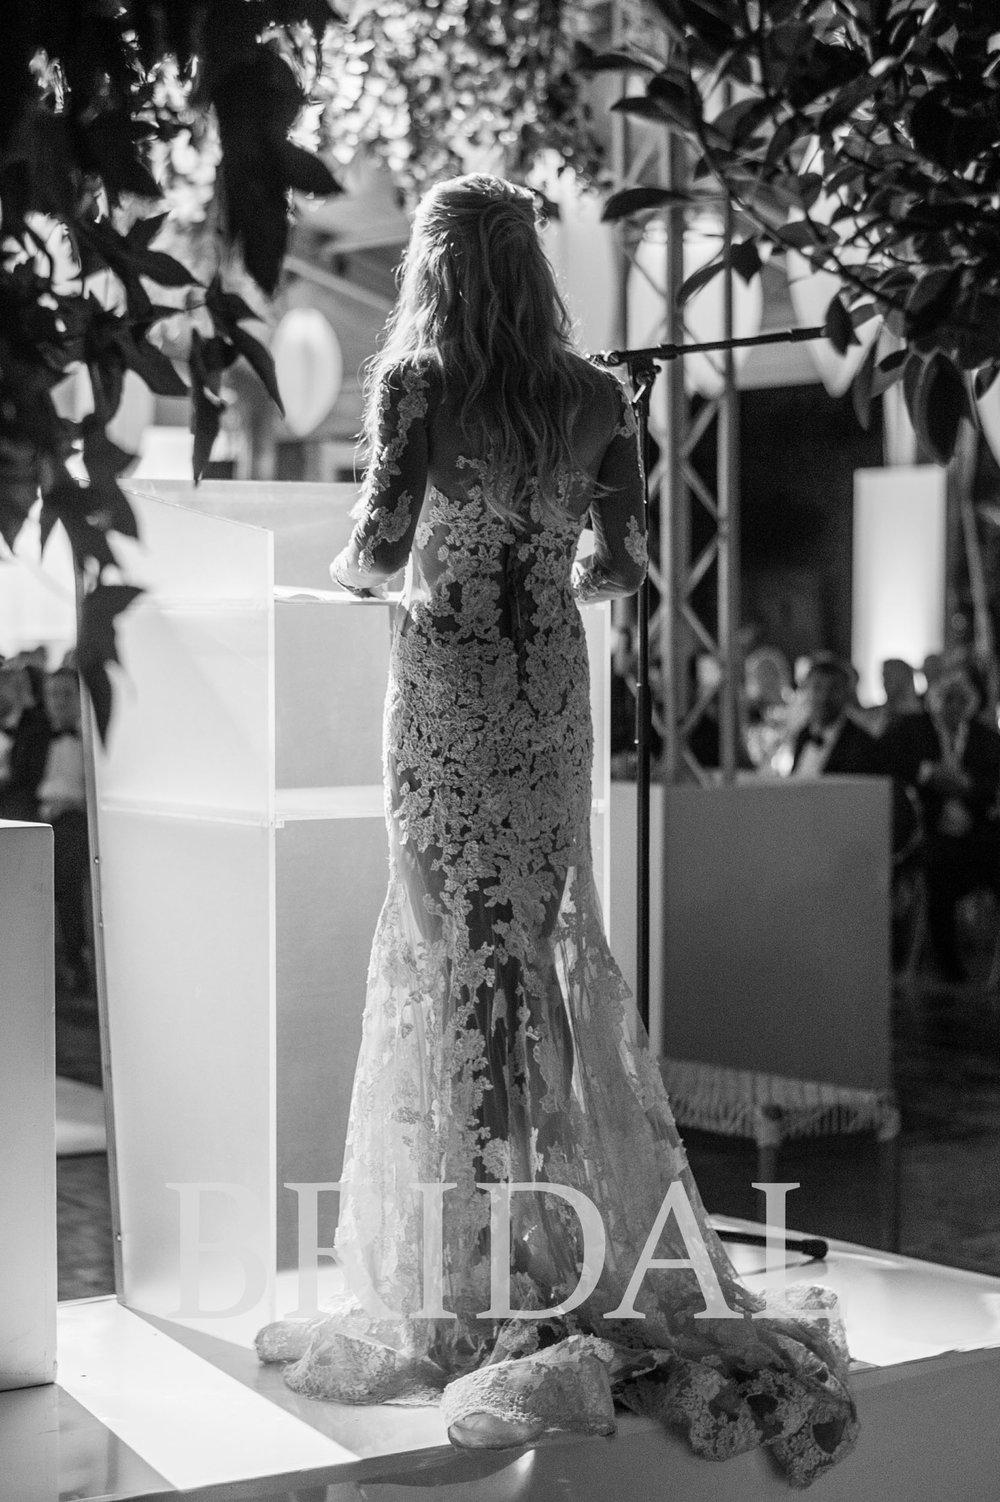 John-henry-wedding-photo-groom-reception-bridal-001-2.JPG